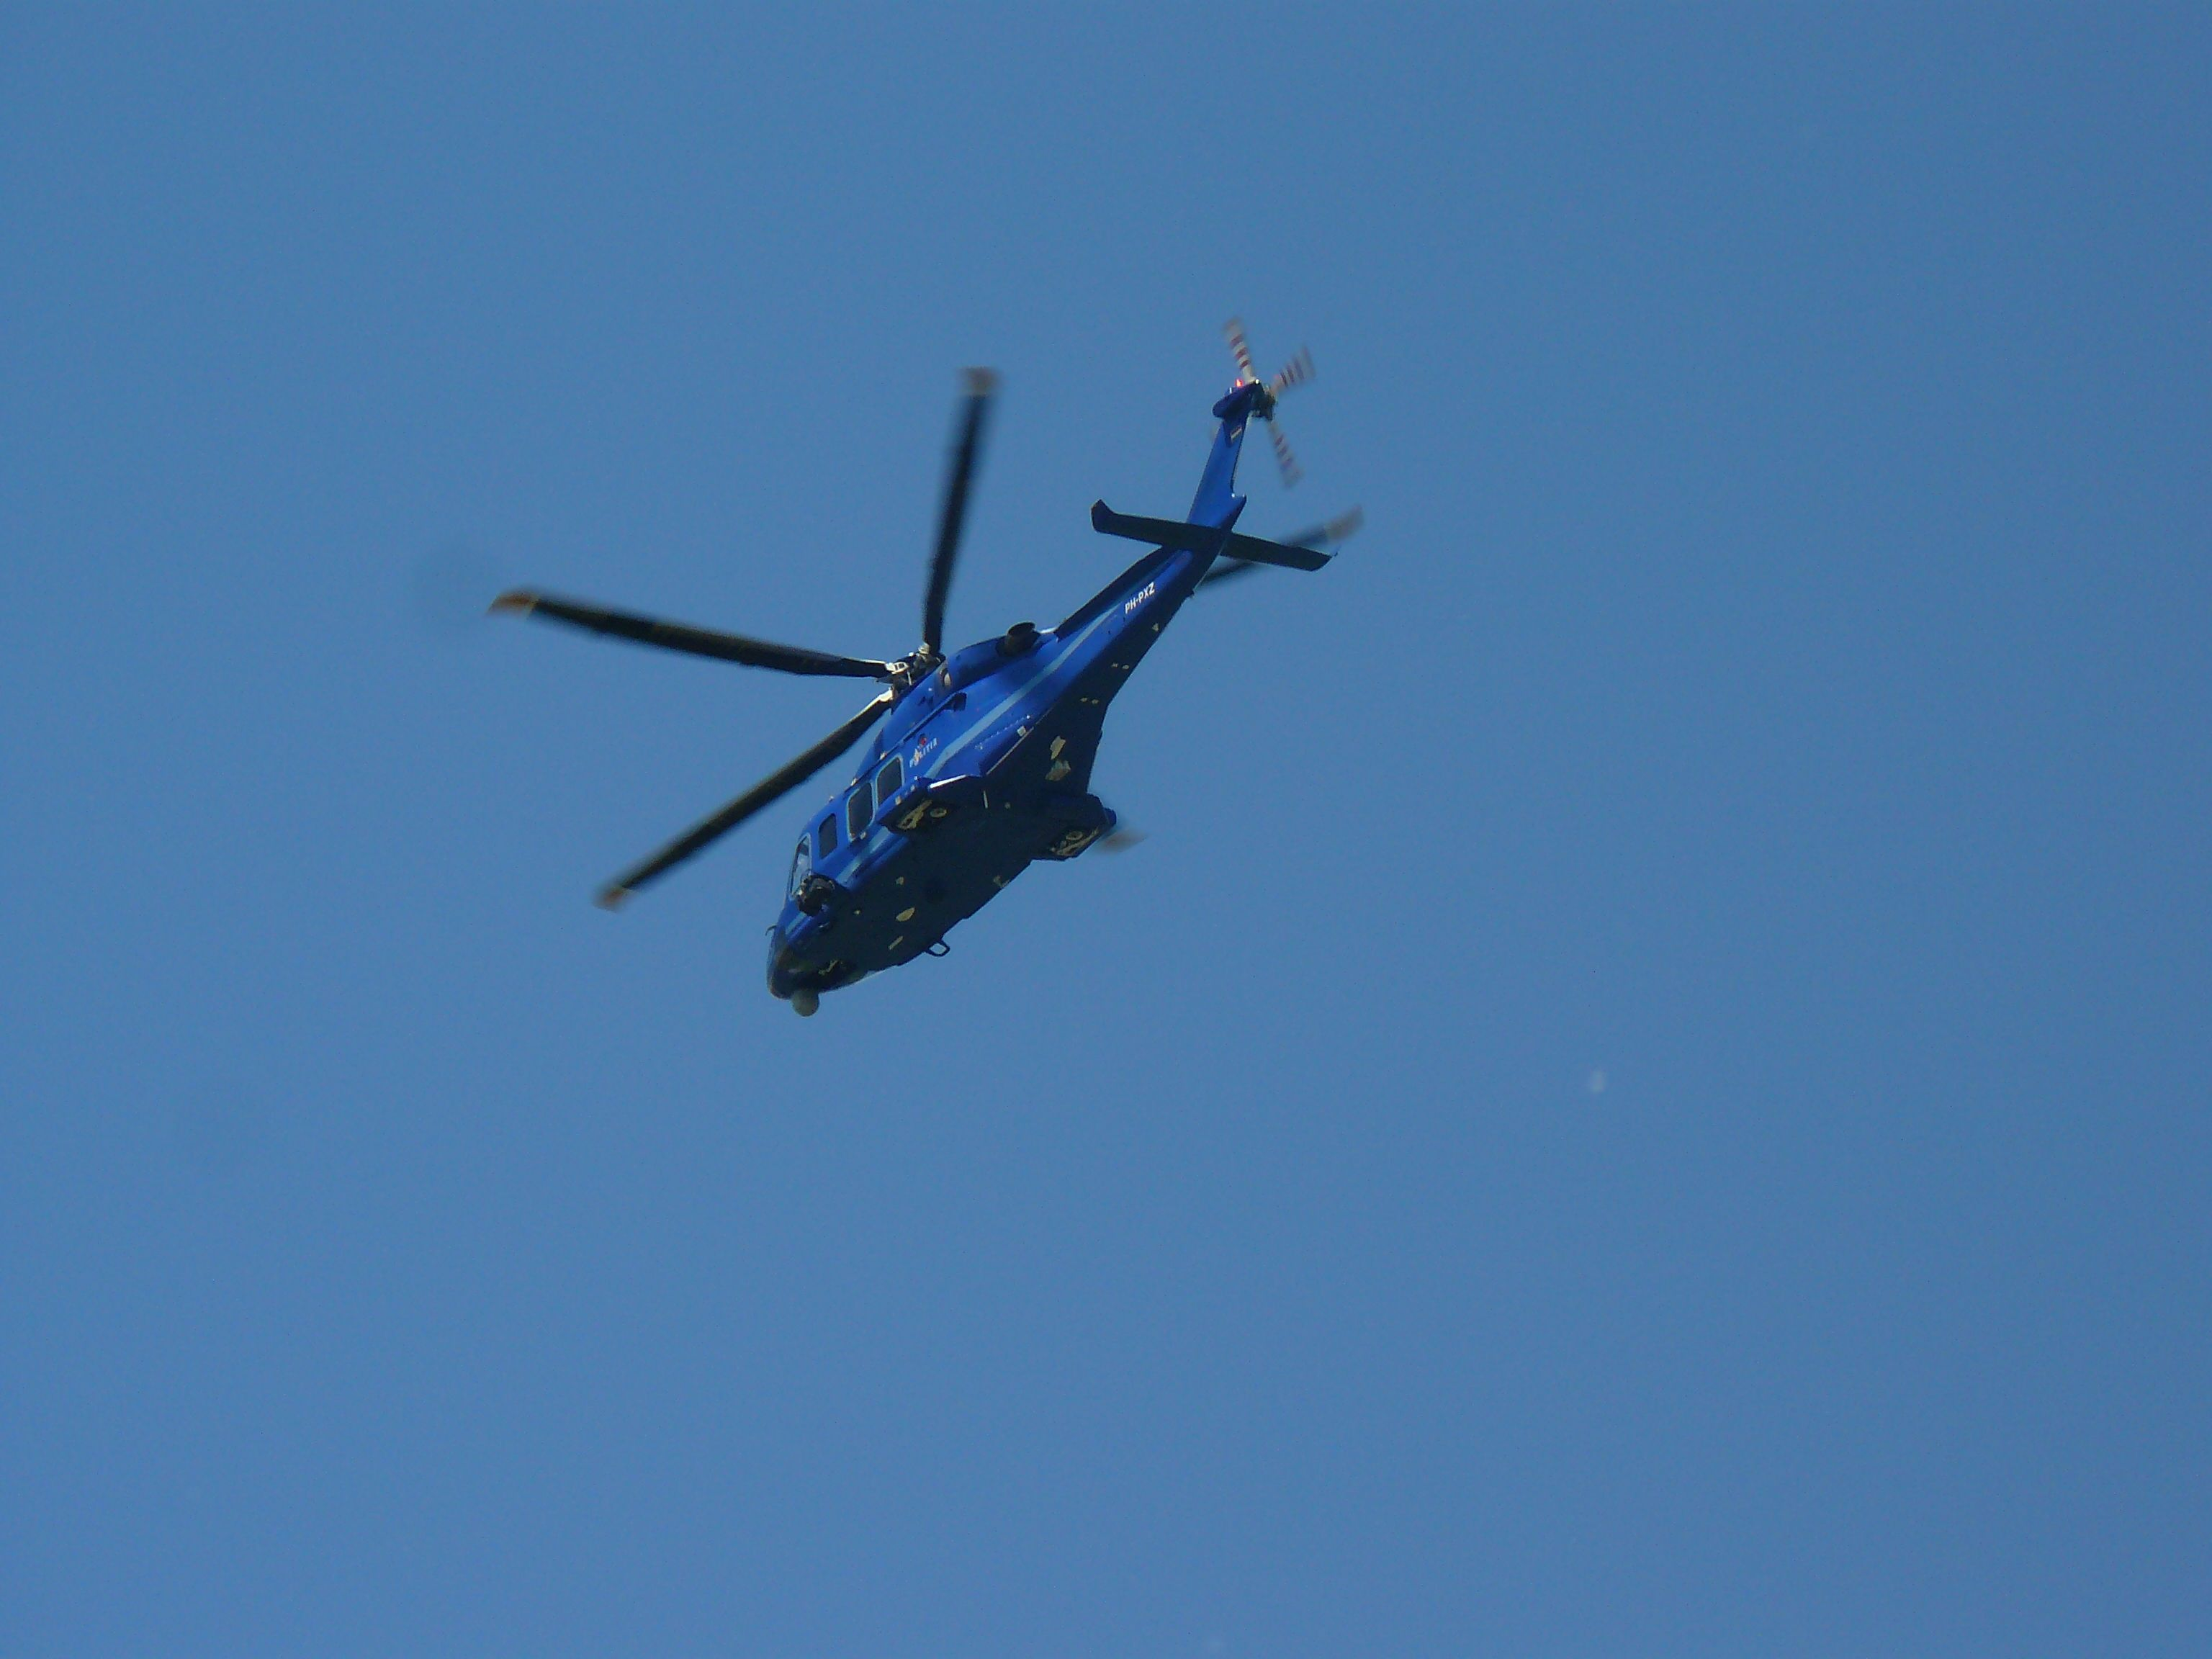 PH-PXZ (Police26) AgustaWestland AW139 boven Arnhem 31-05-2014